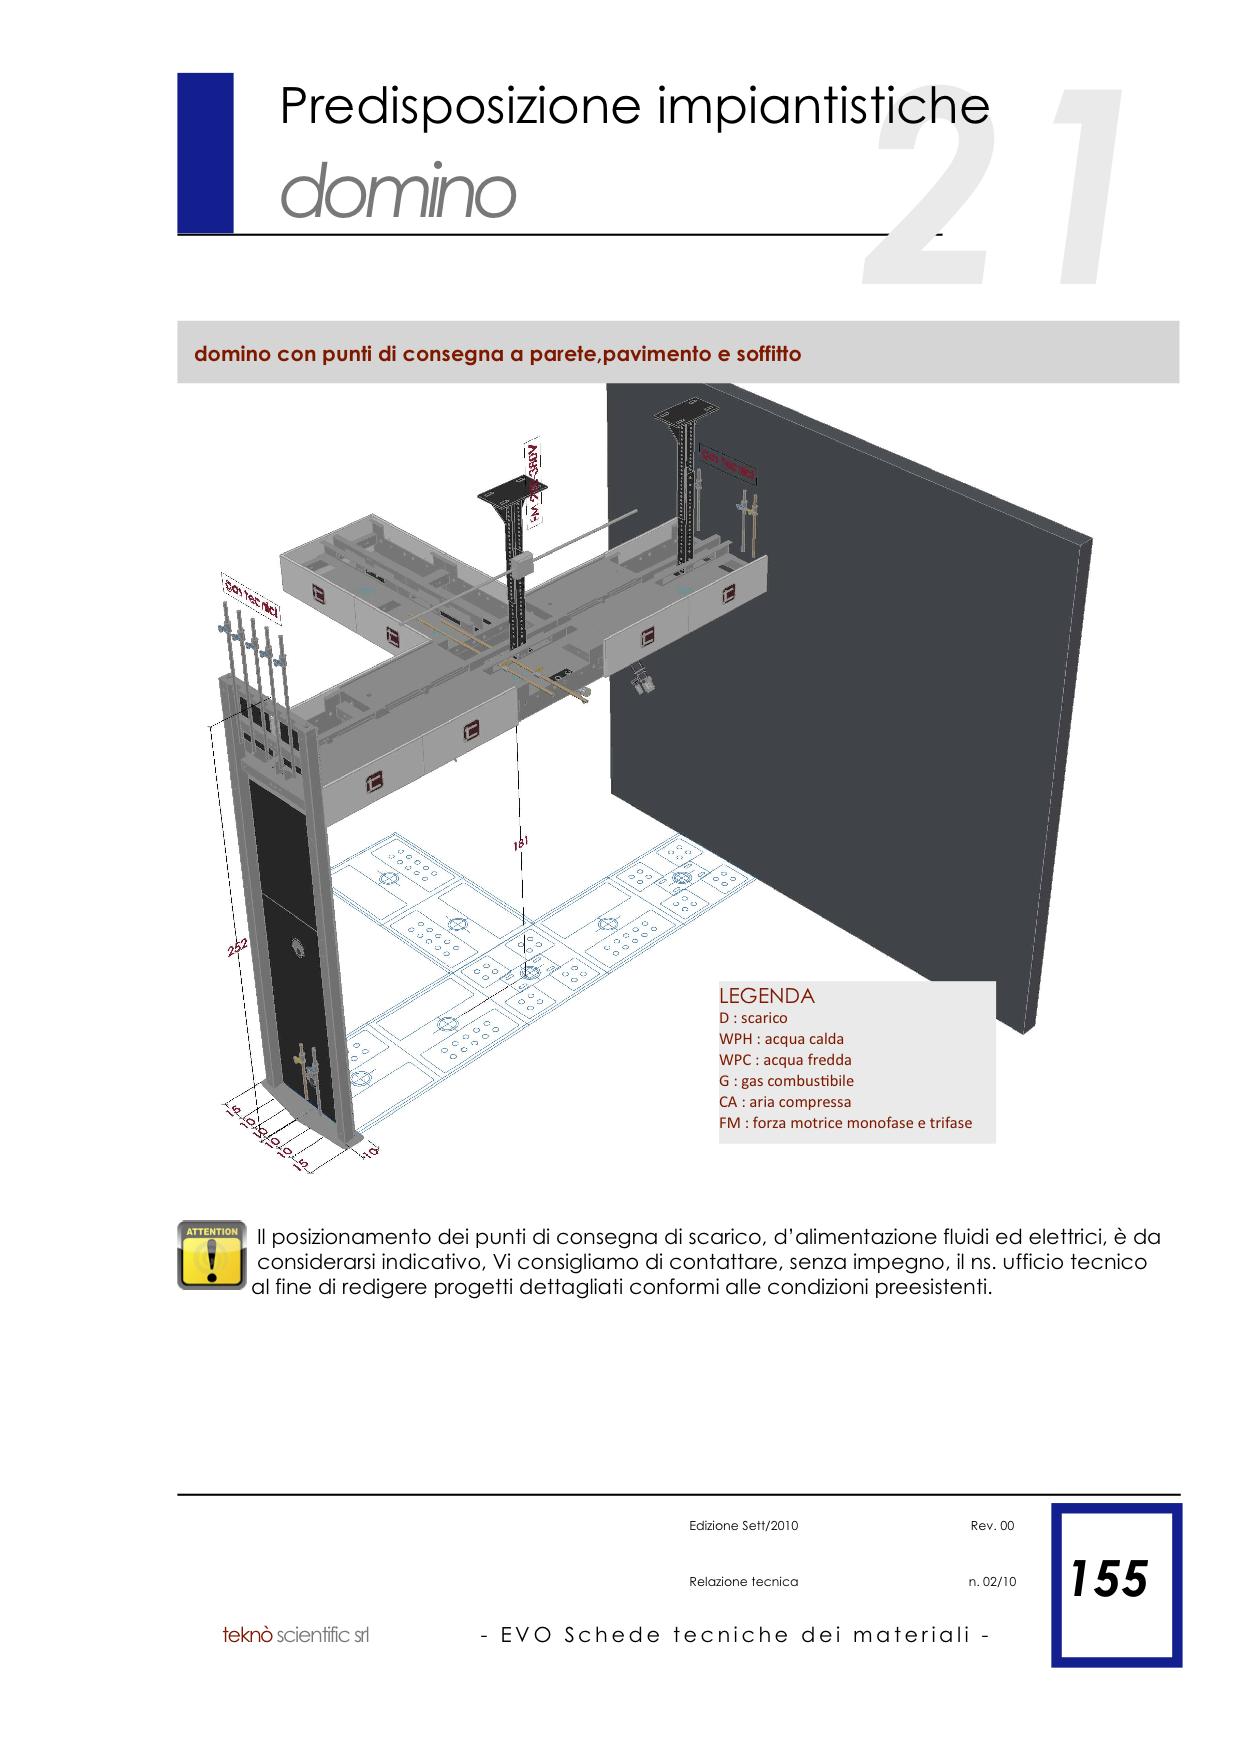 EVO Schede Tecniche materiali copia 24.png